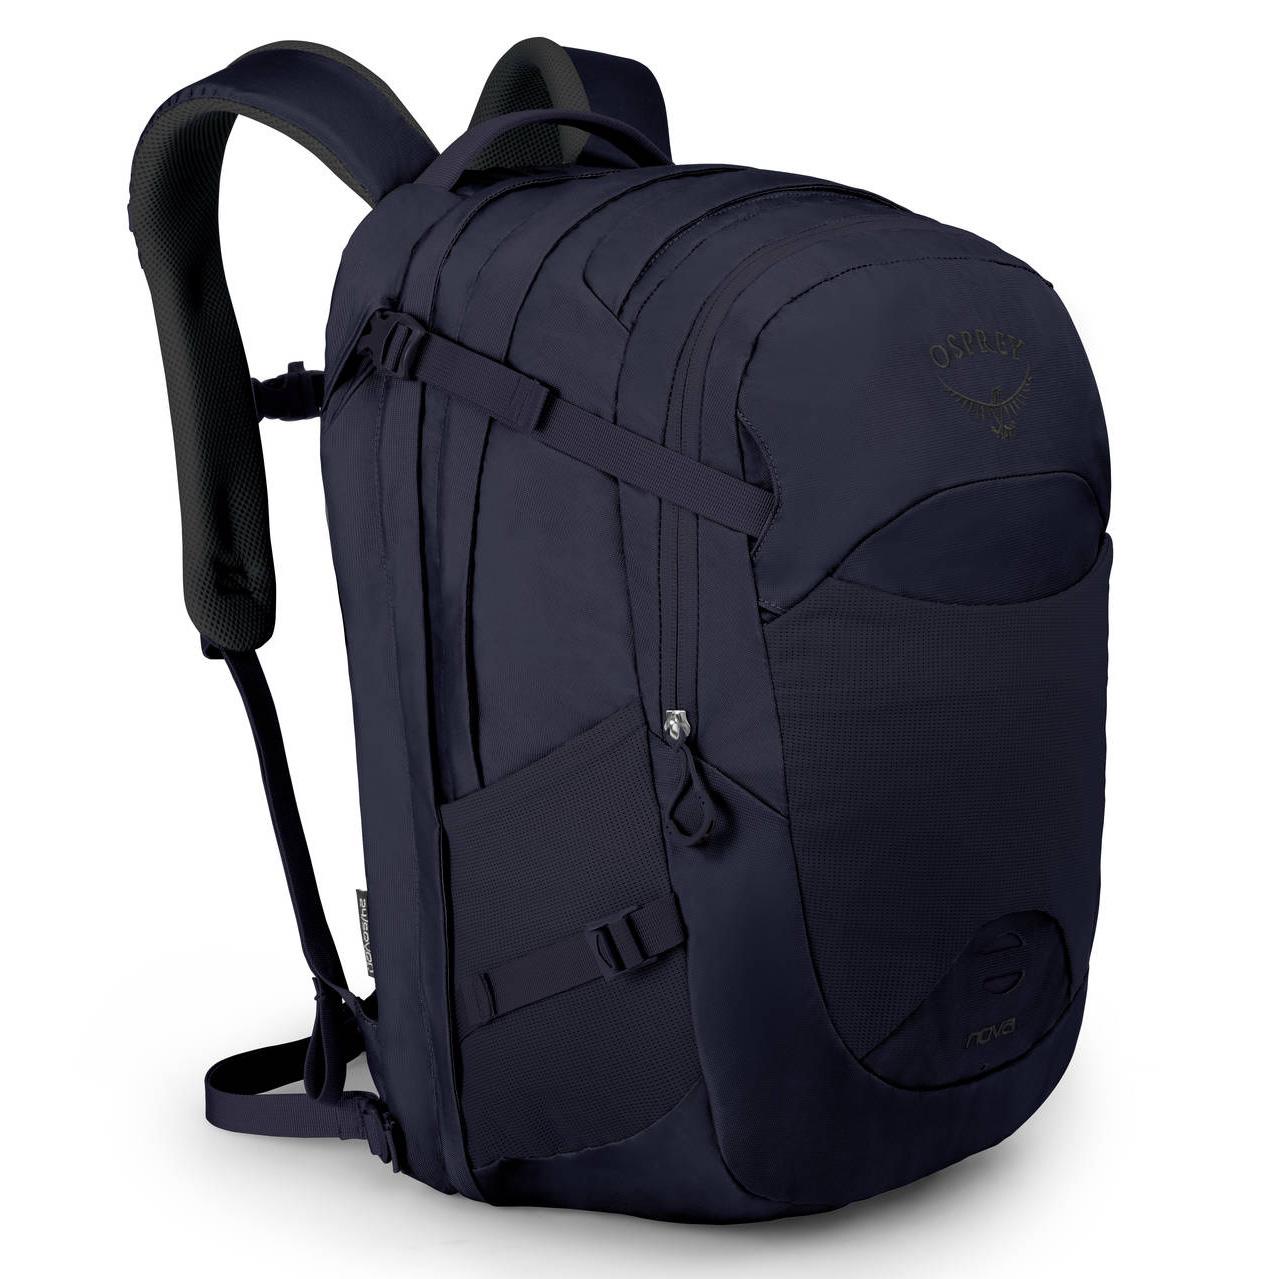 Image of Osprey Nova 32 - Women's Backpack - Juneberry Purple